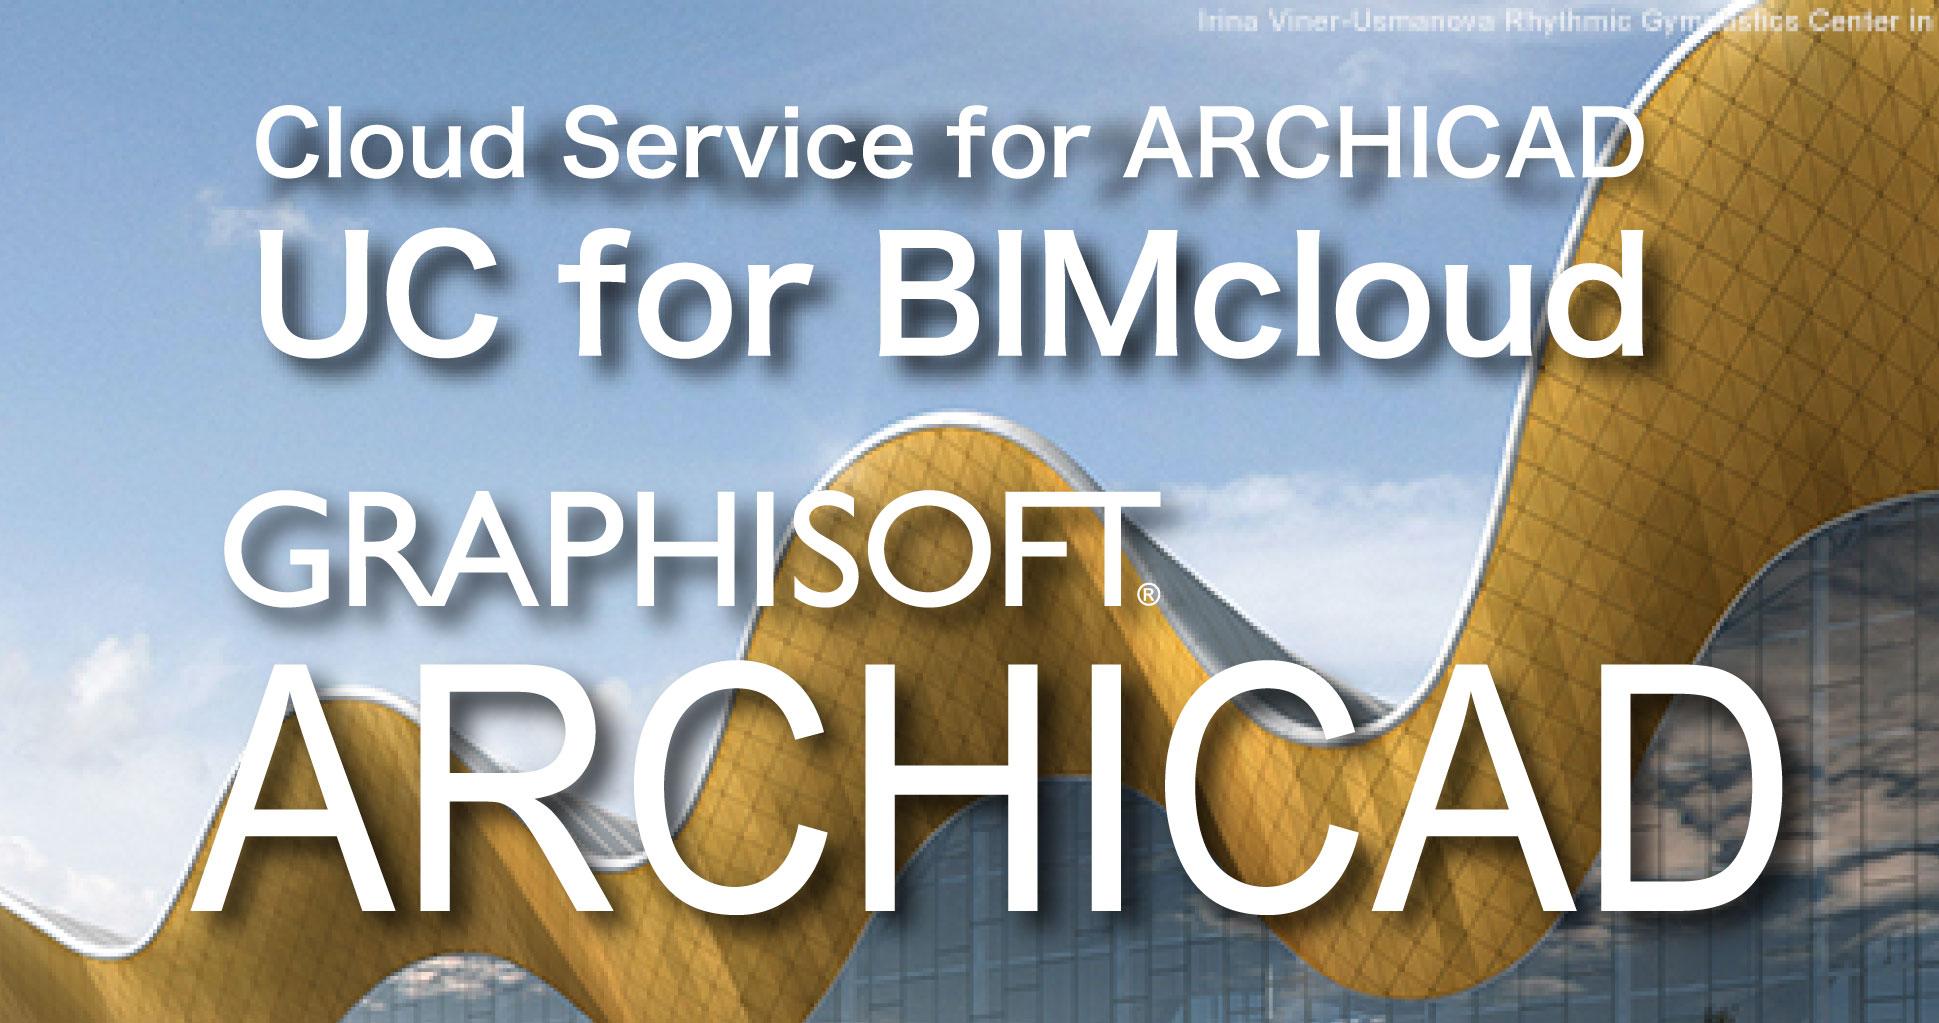 Cloud service for ARCHICAD, UC for BIMcloud